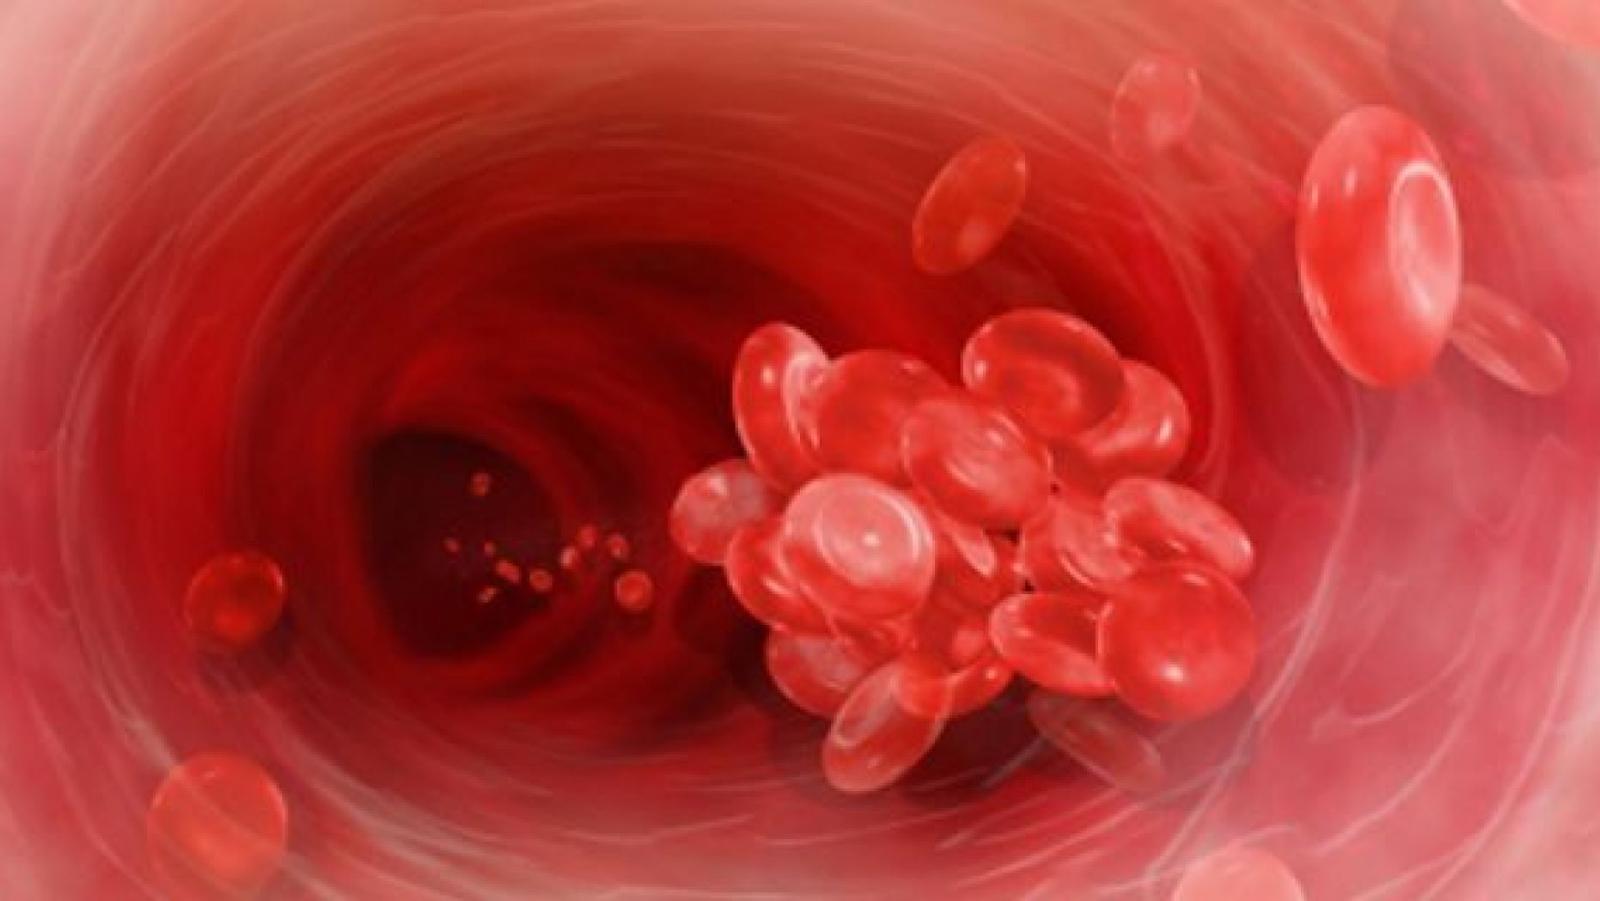 Кровяные тельца.